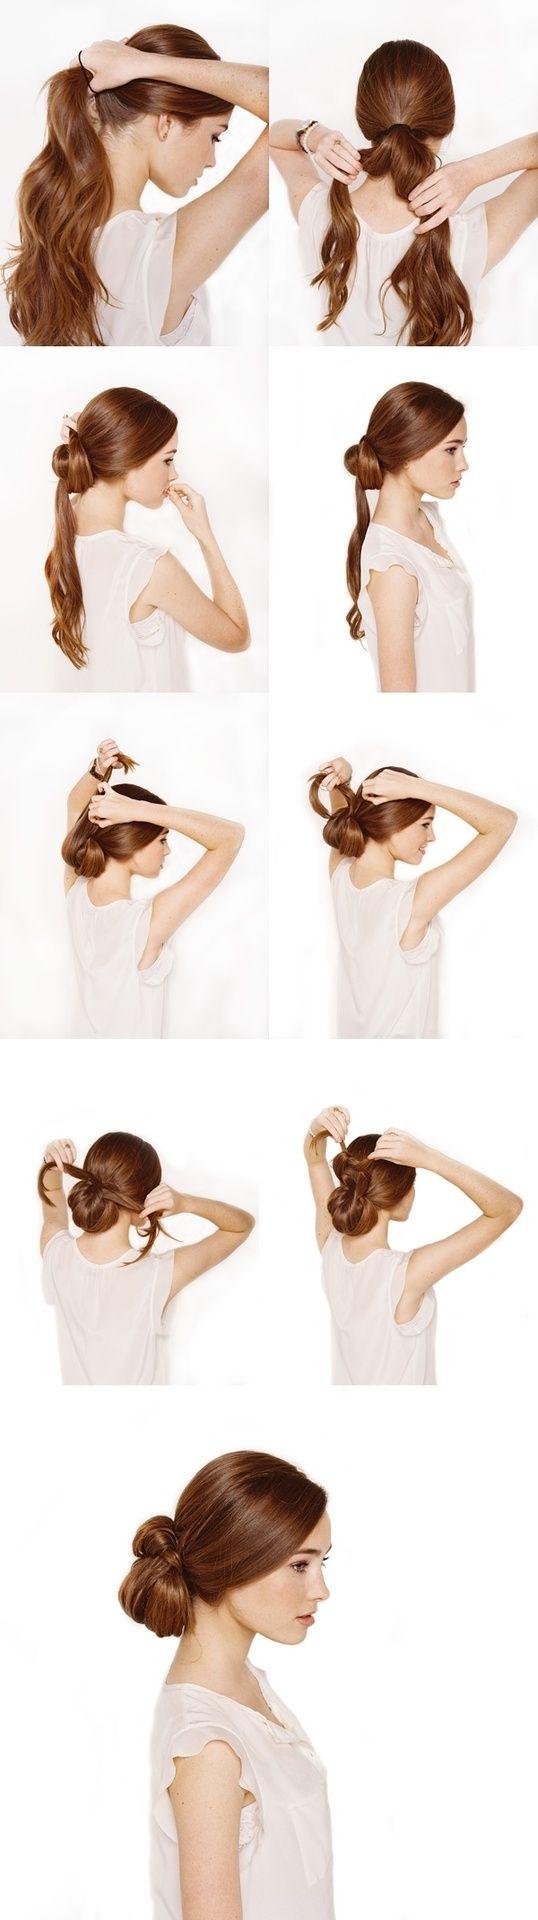 194 best Hairups images on Pinterest | Hairstyle ideas, Hair ideas ...